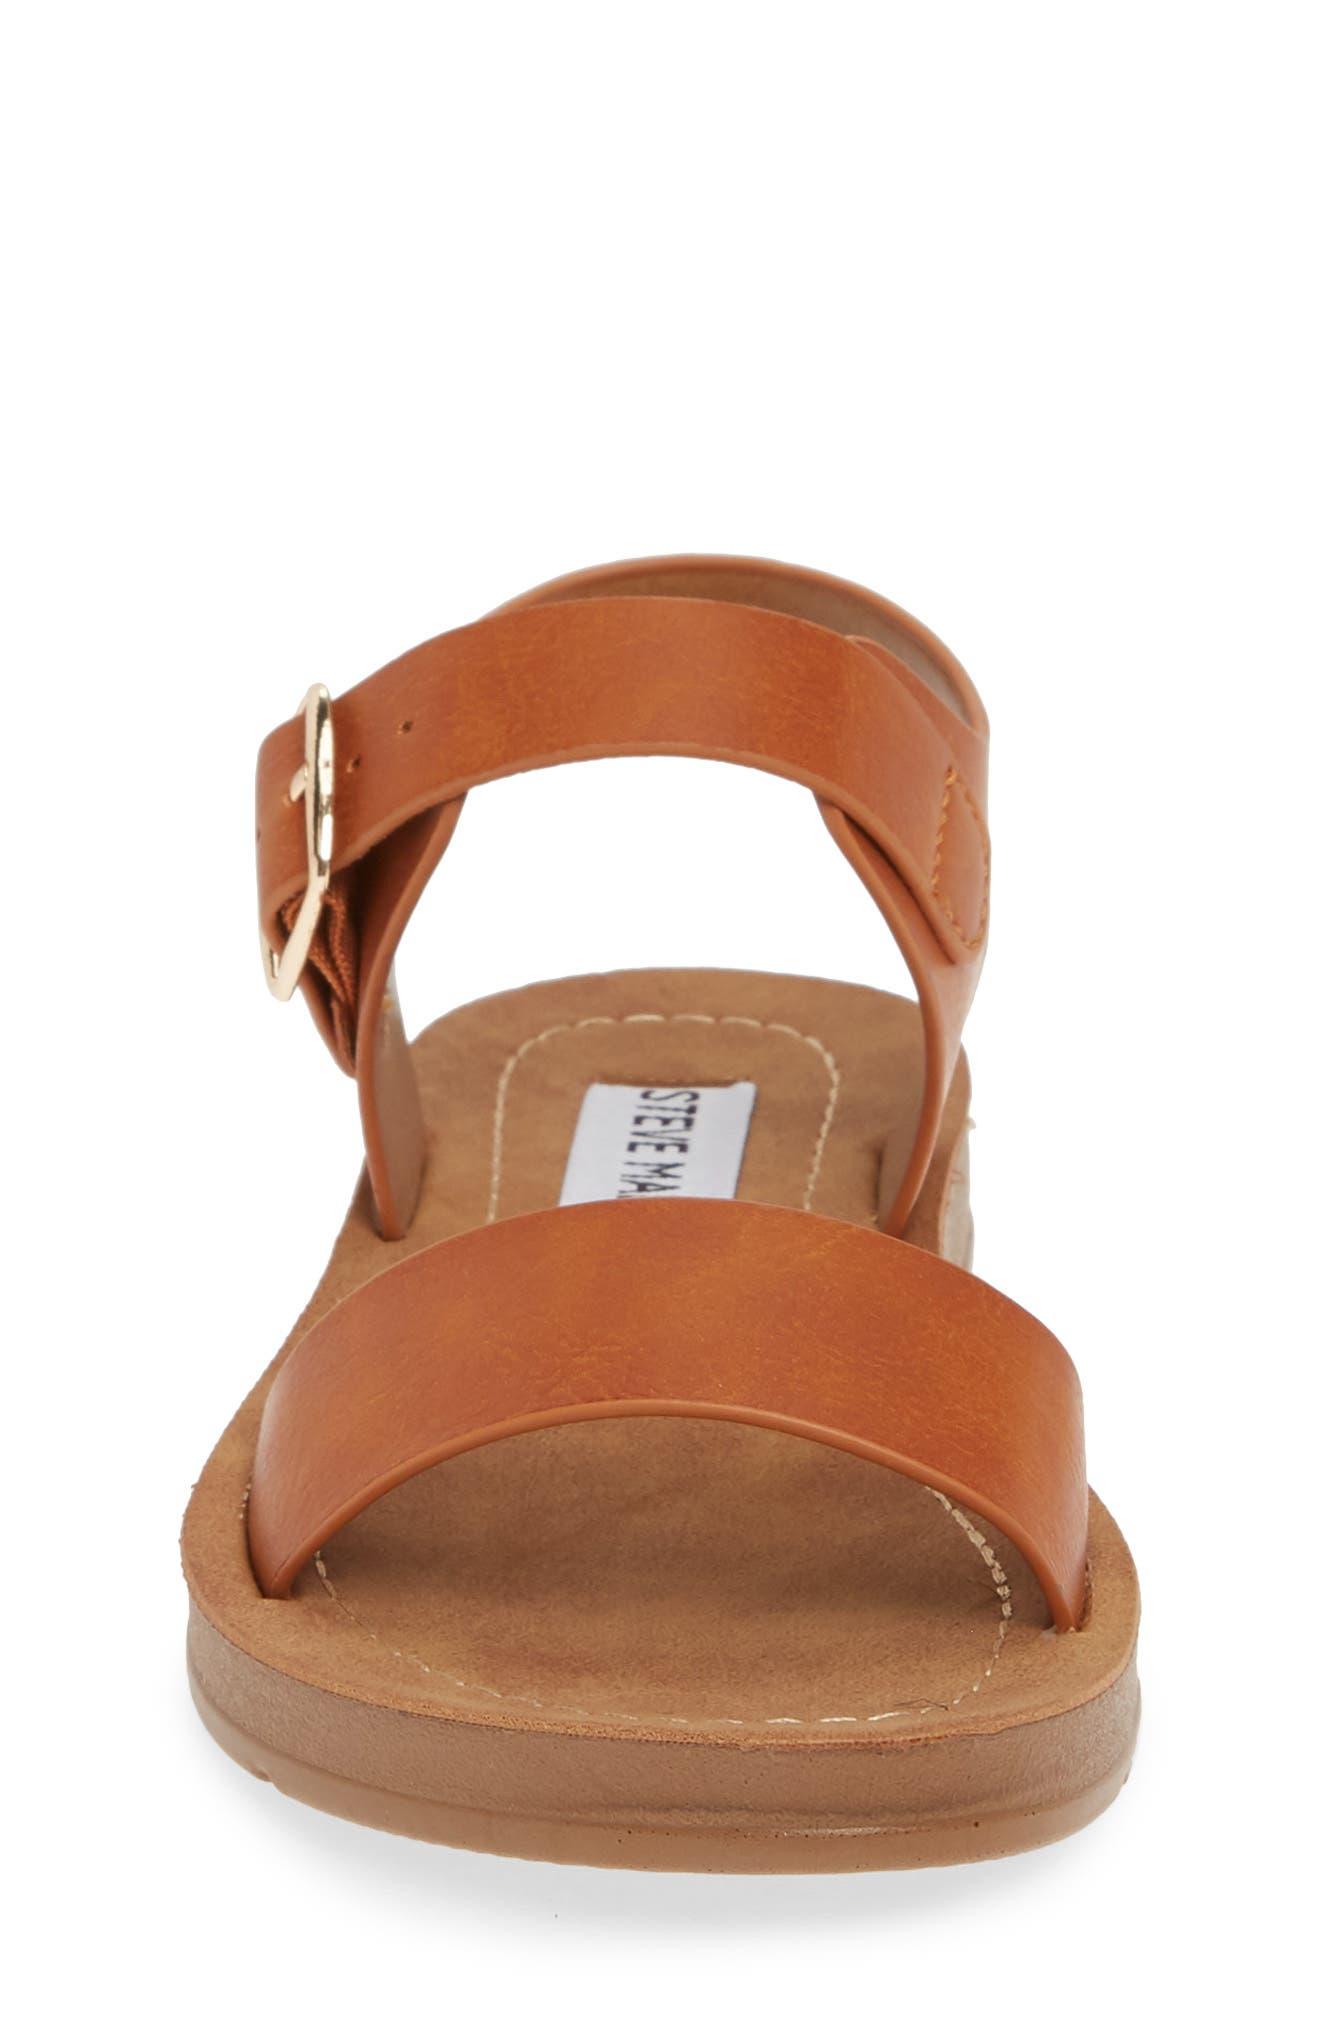 Steve Madden Kids' Probler Platform Sandal In Beige/khaki